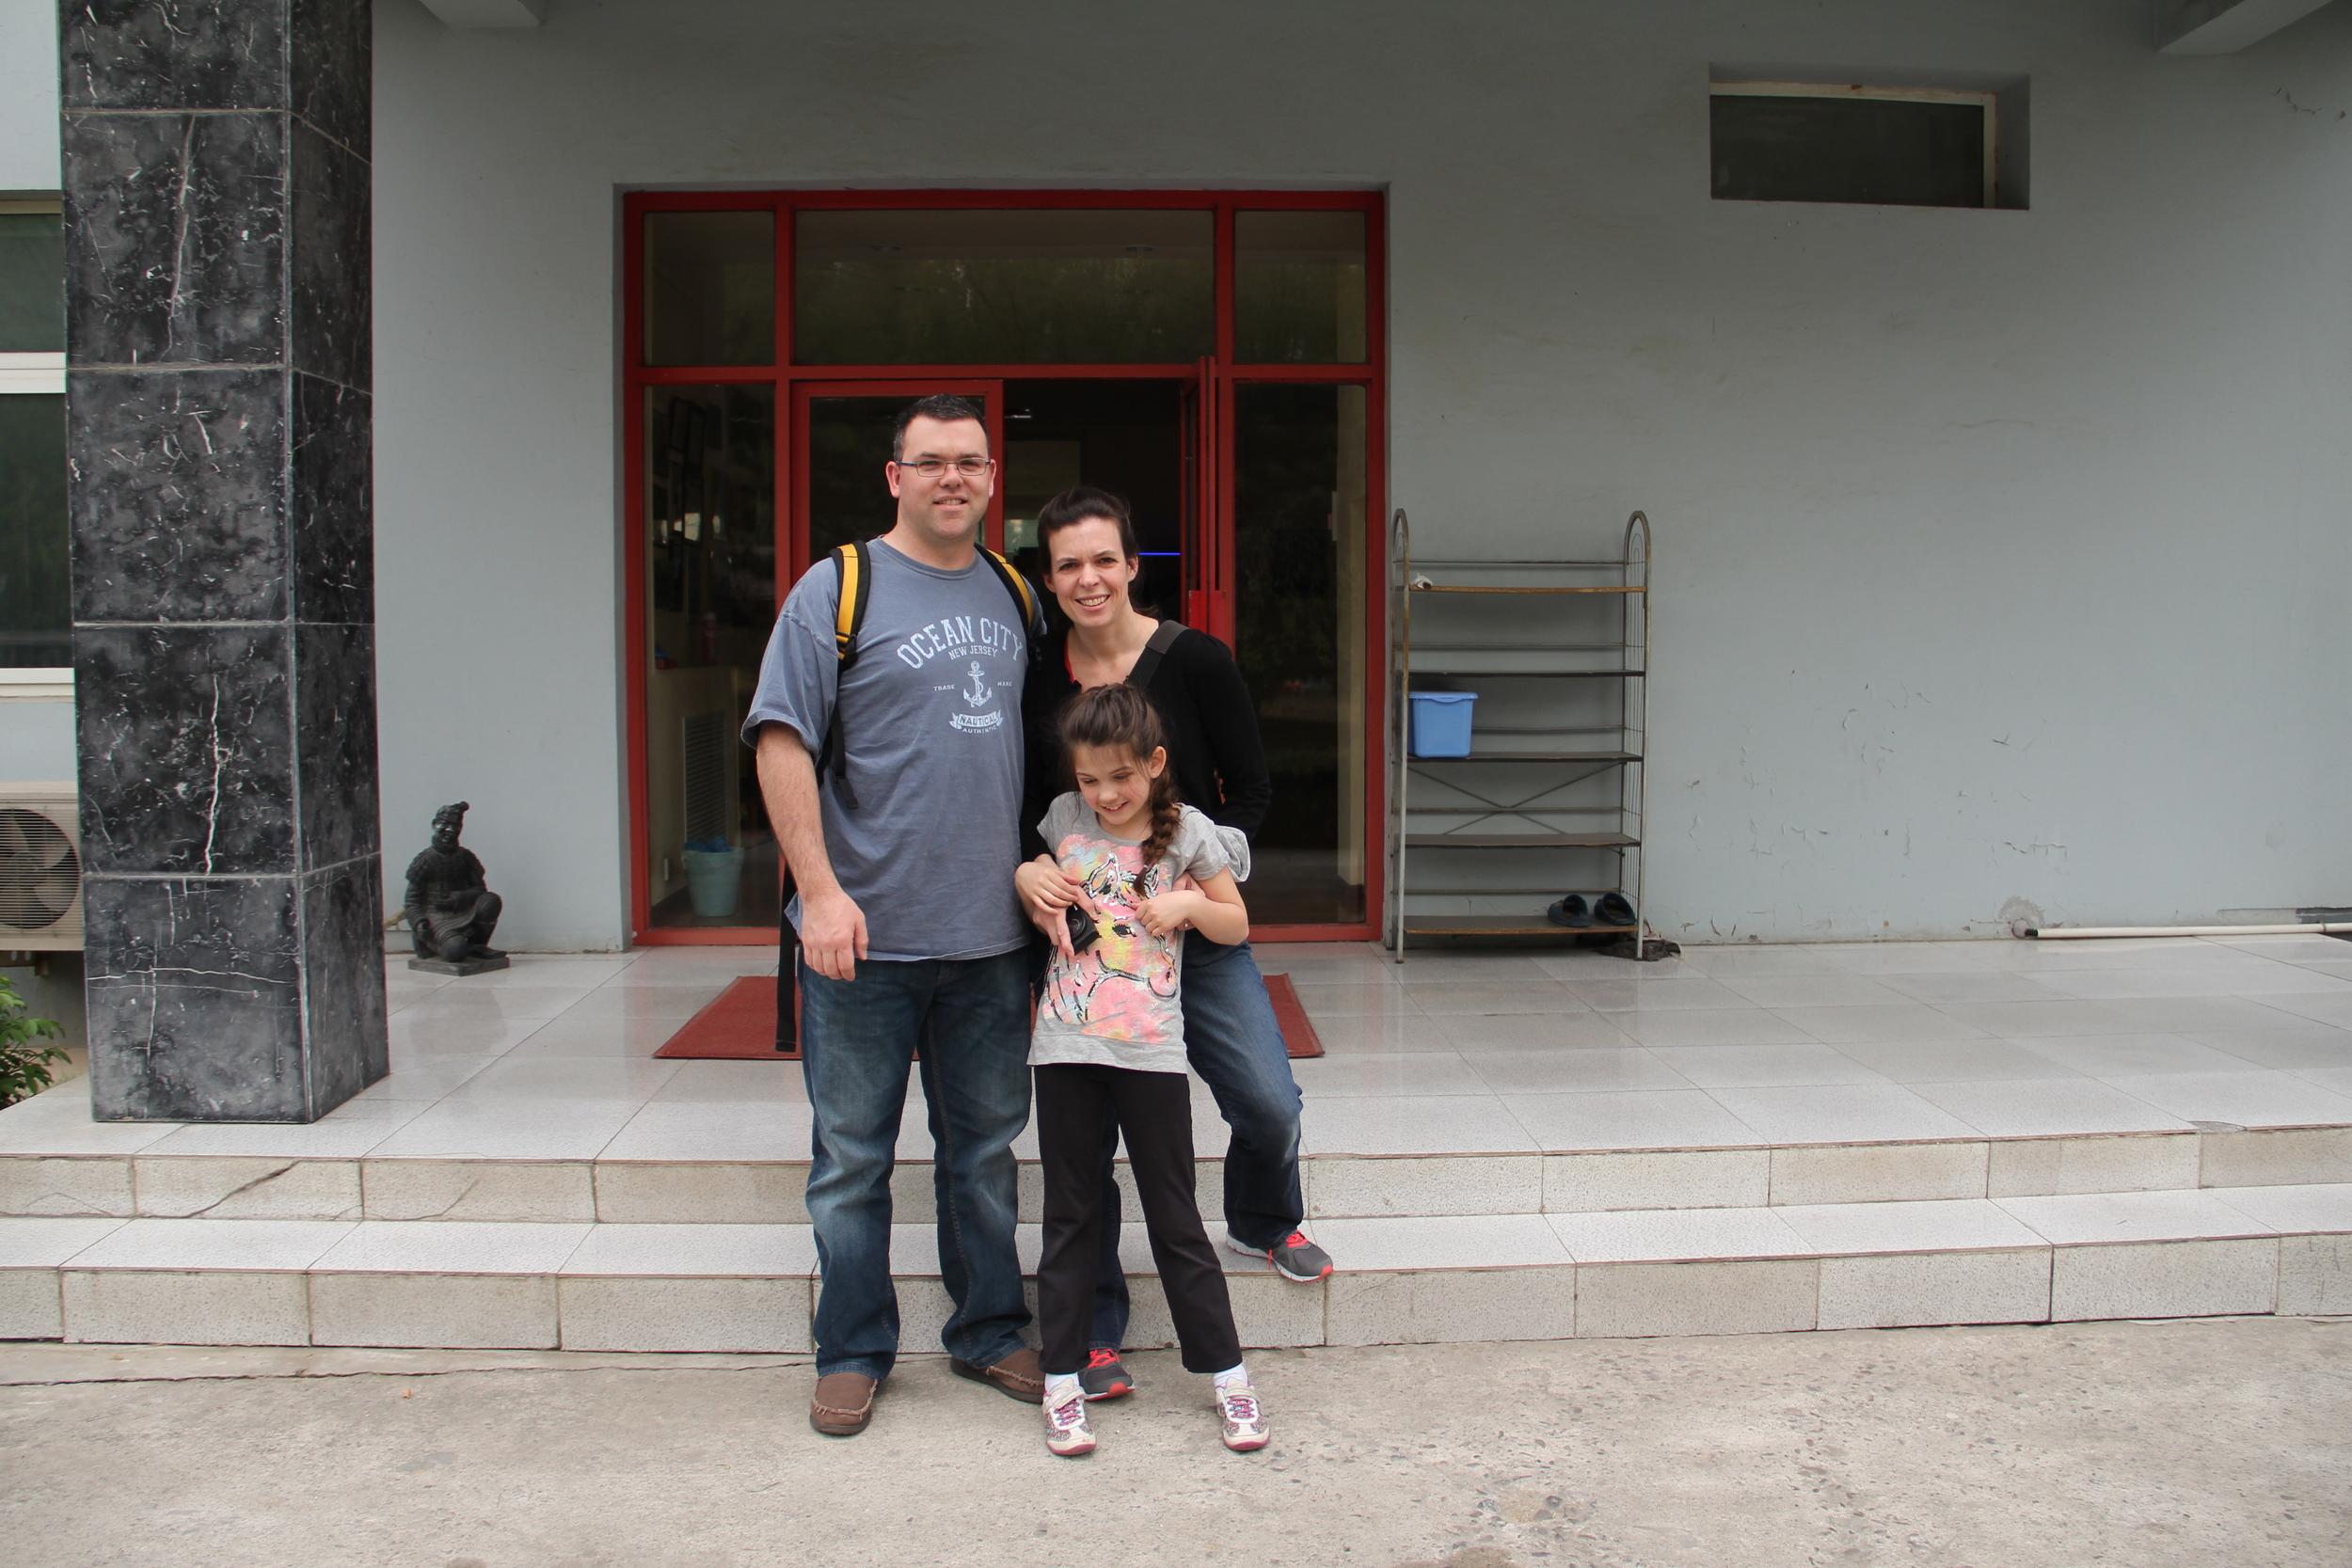 Outside the orphanage